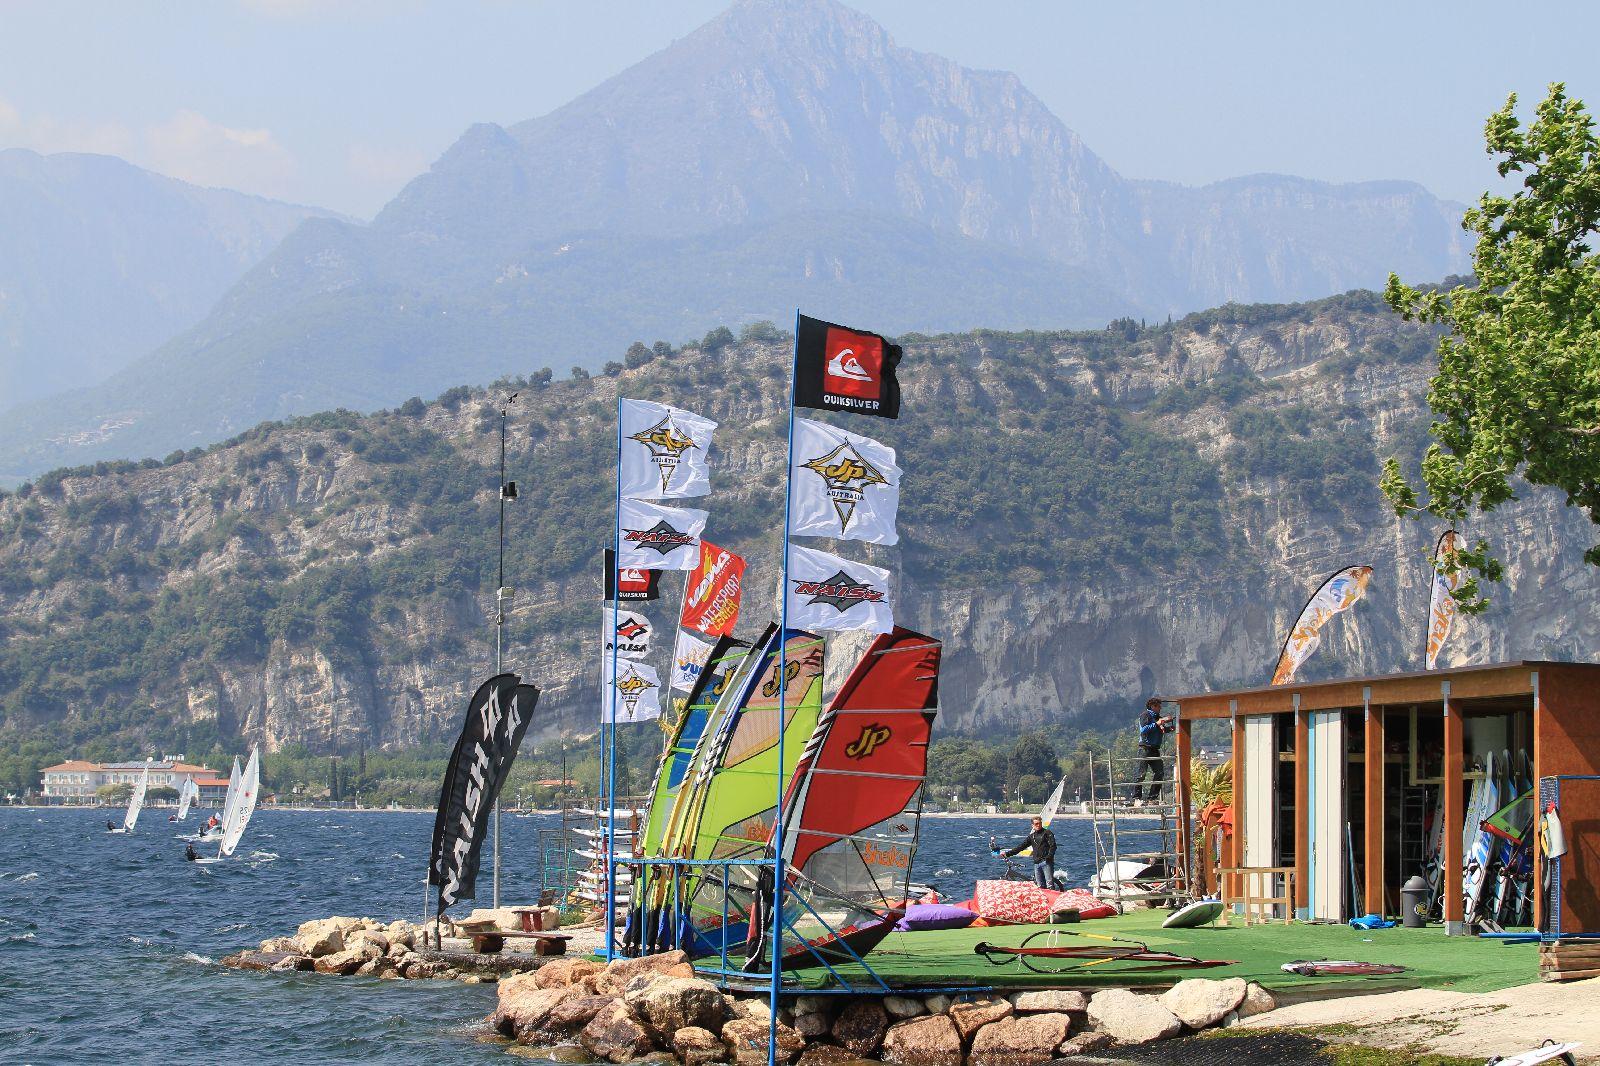 Windsurfing_Gardasee_IMG_0180.JPG